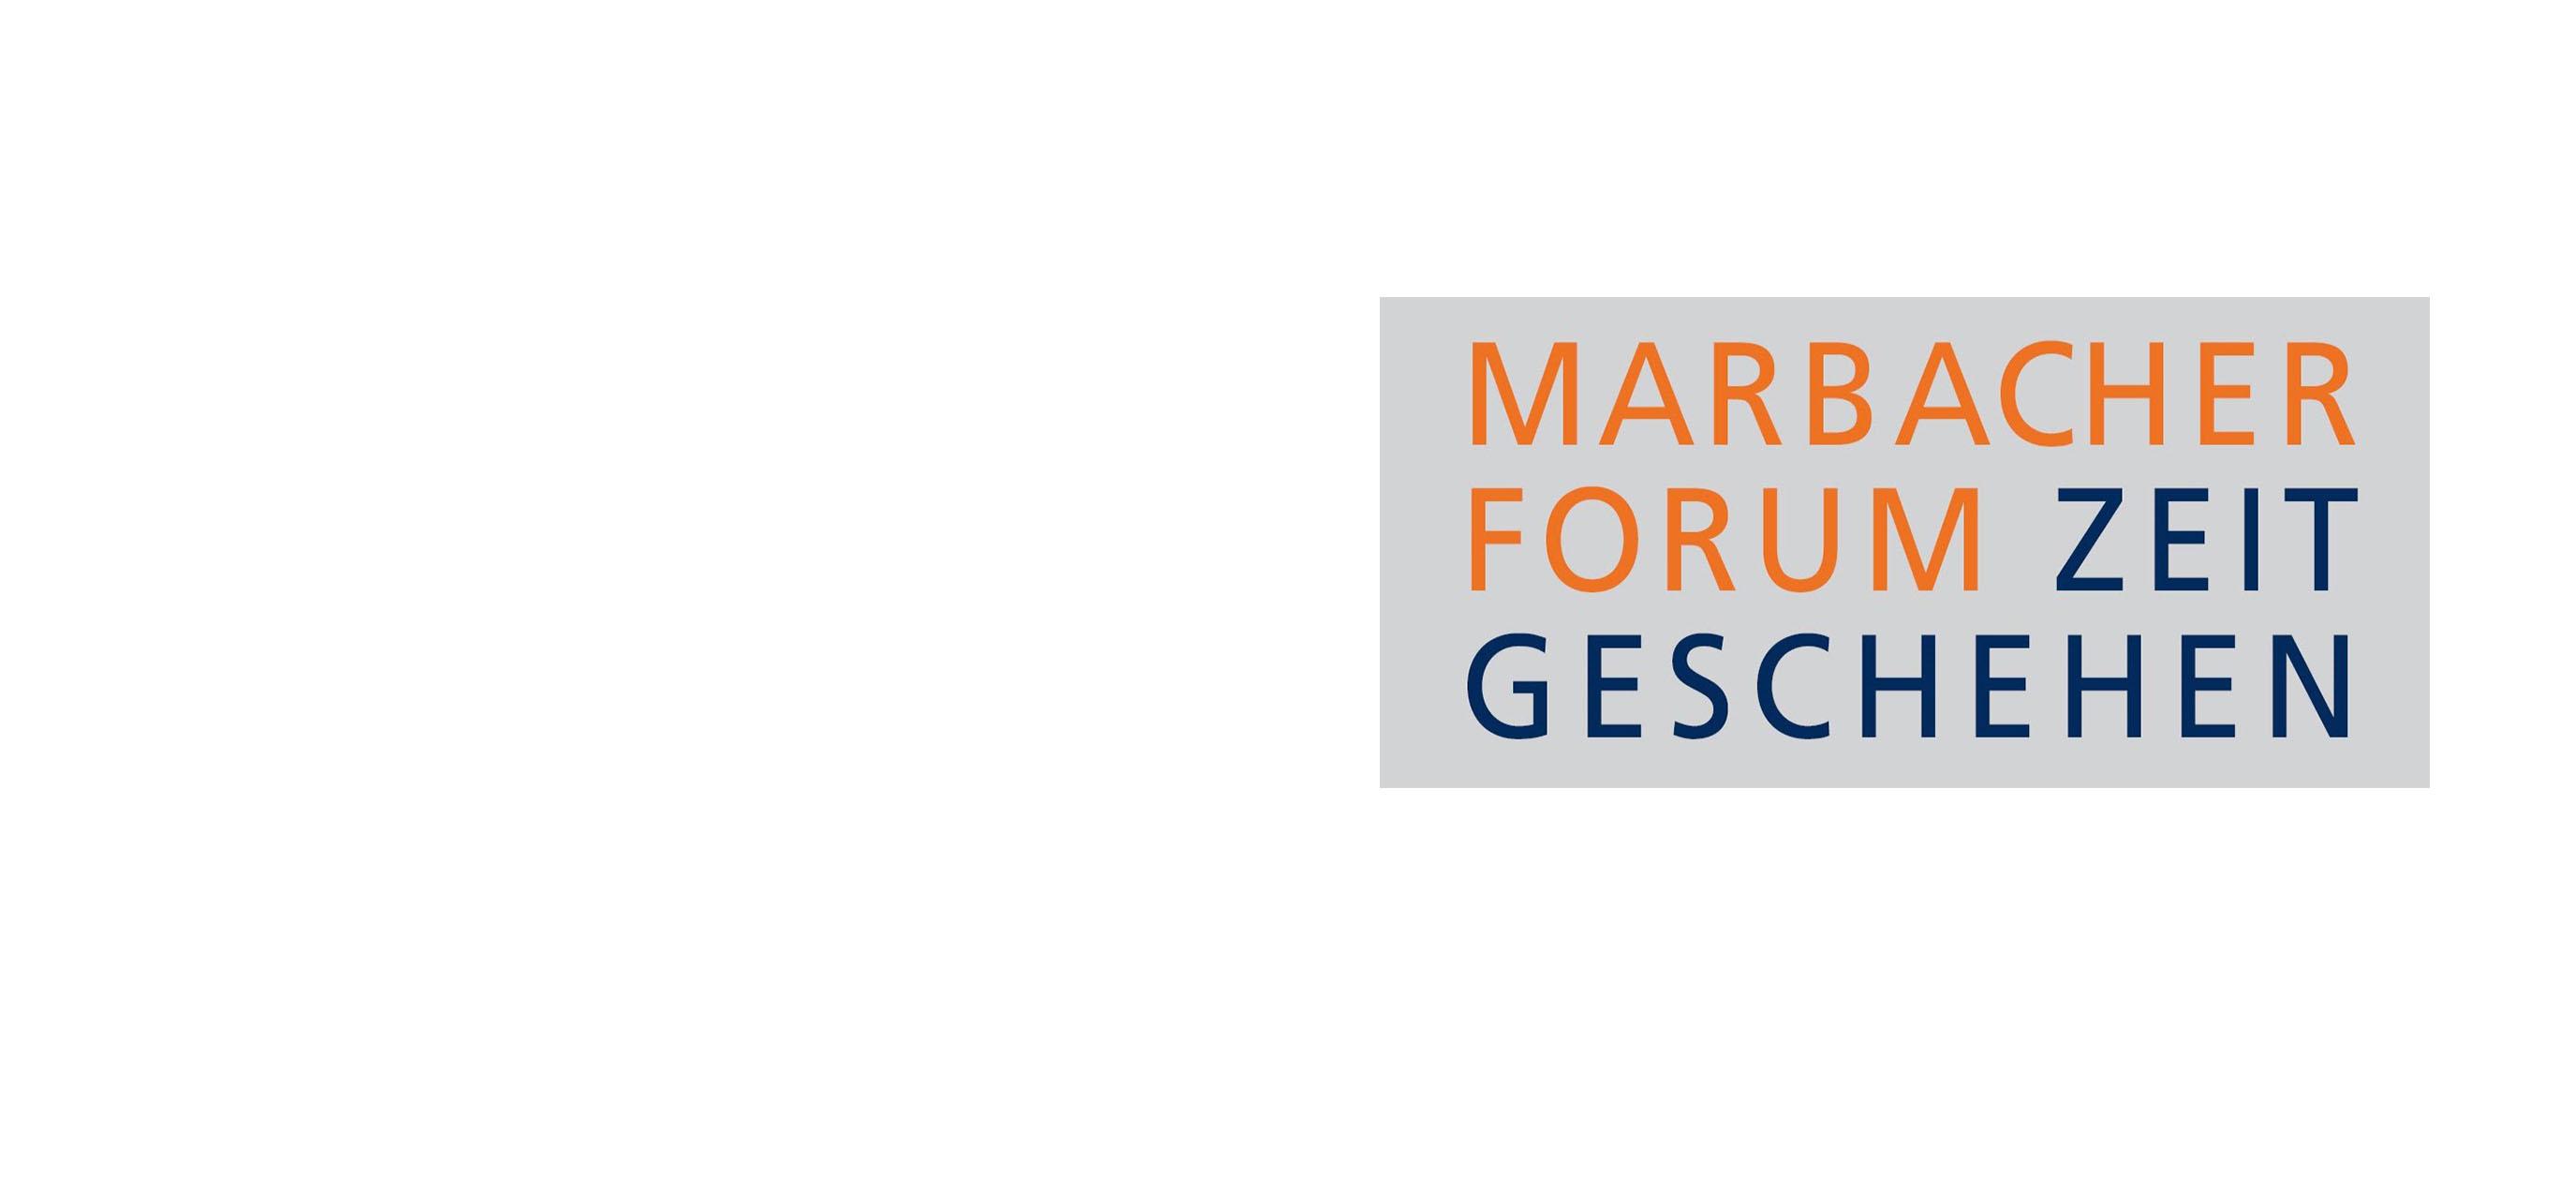 Bild: Marbacher Forum Zeitgescheschen